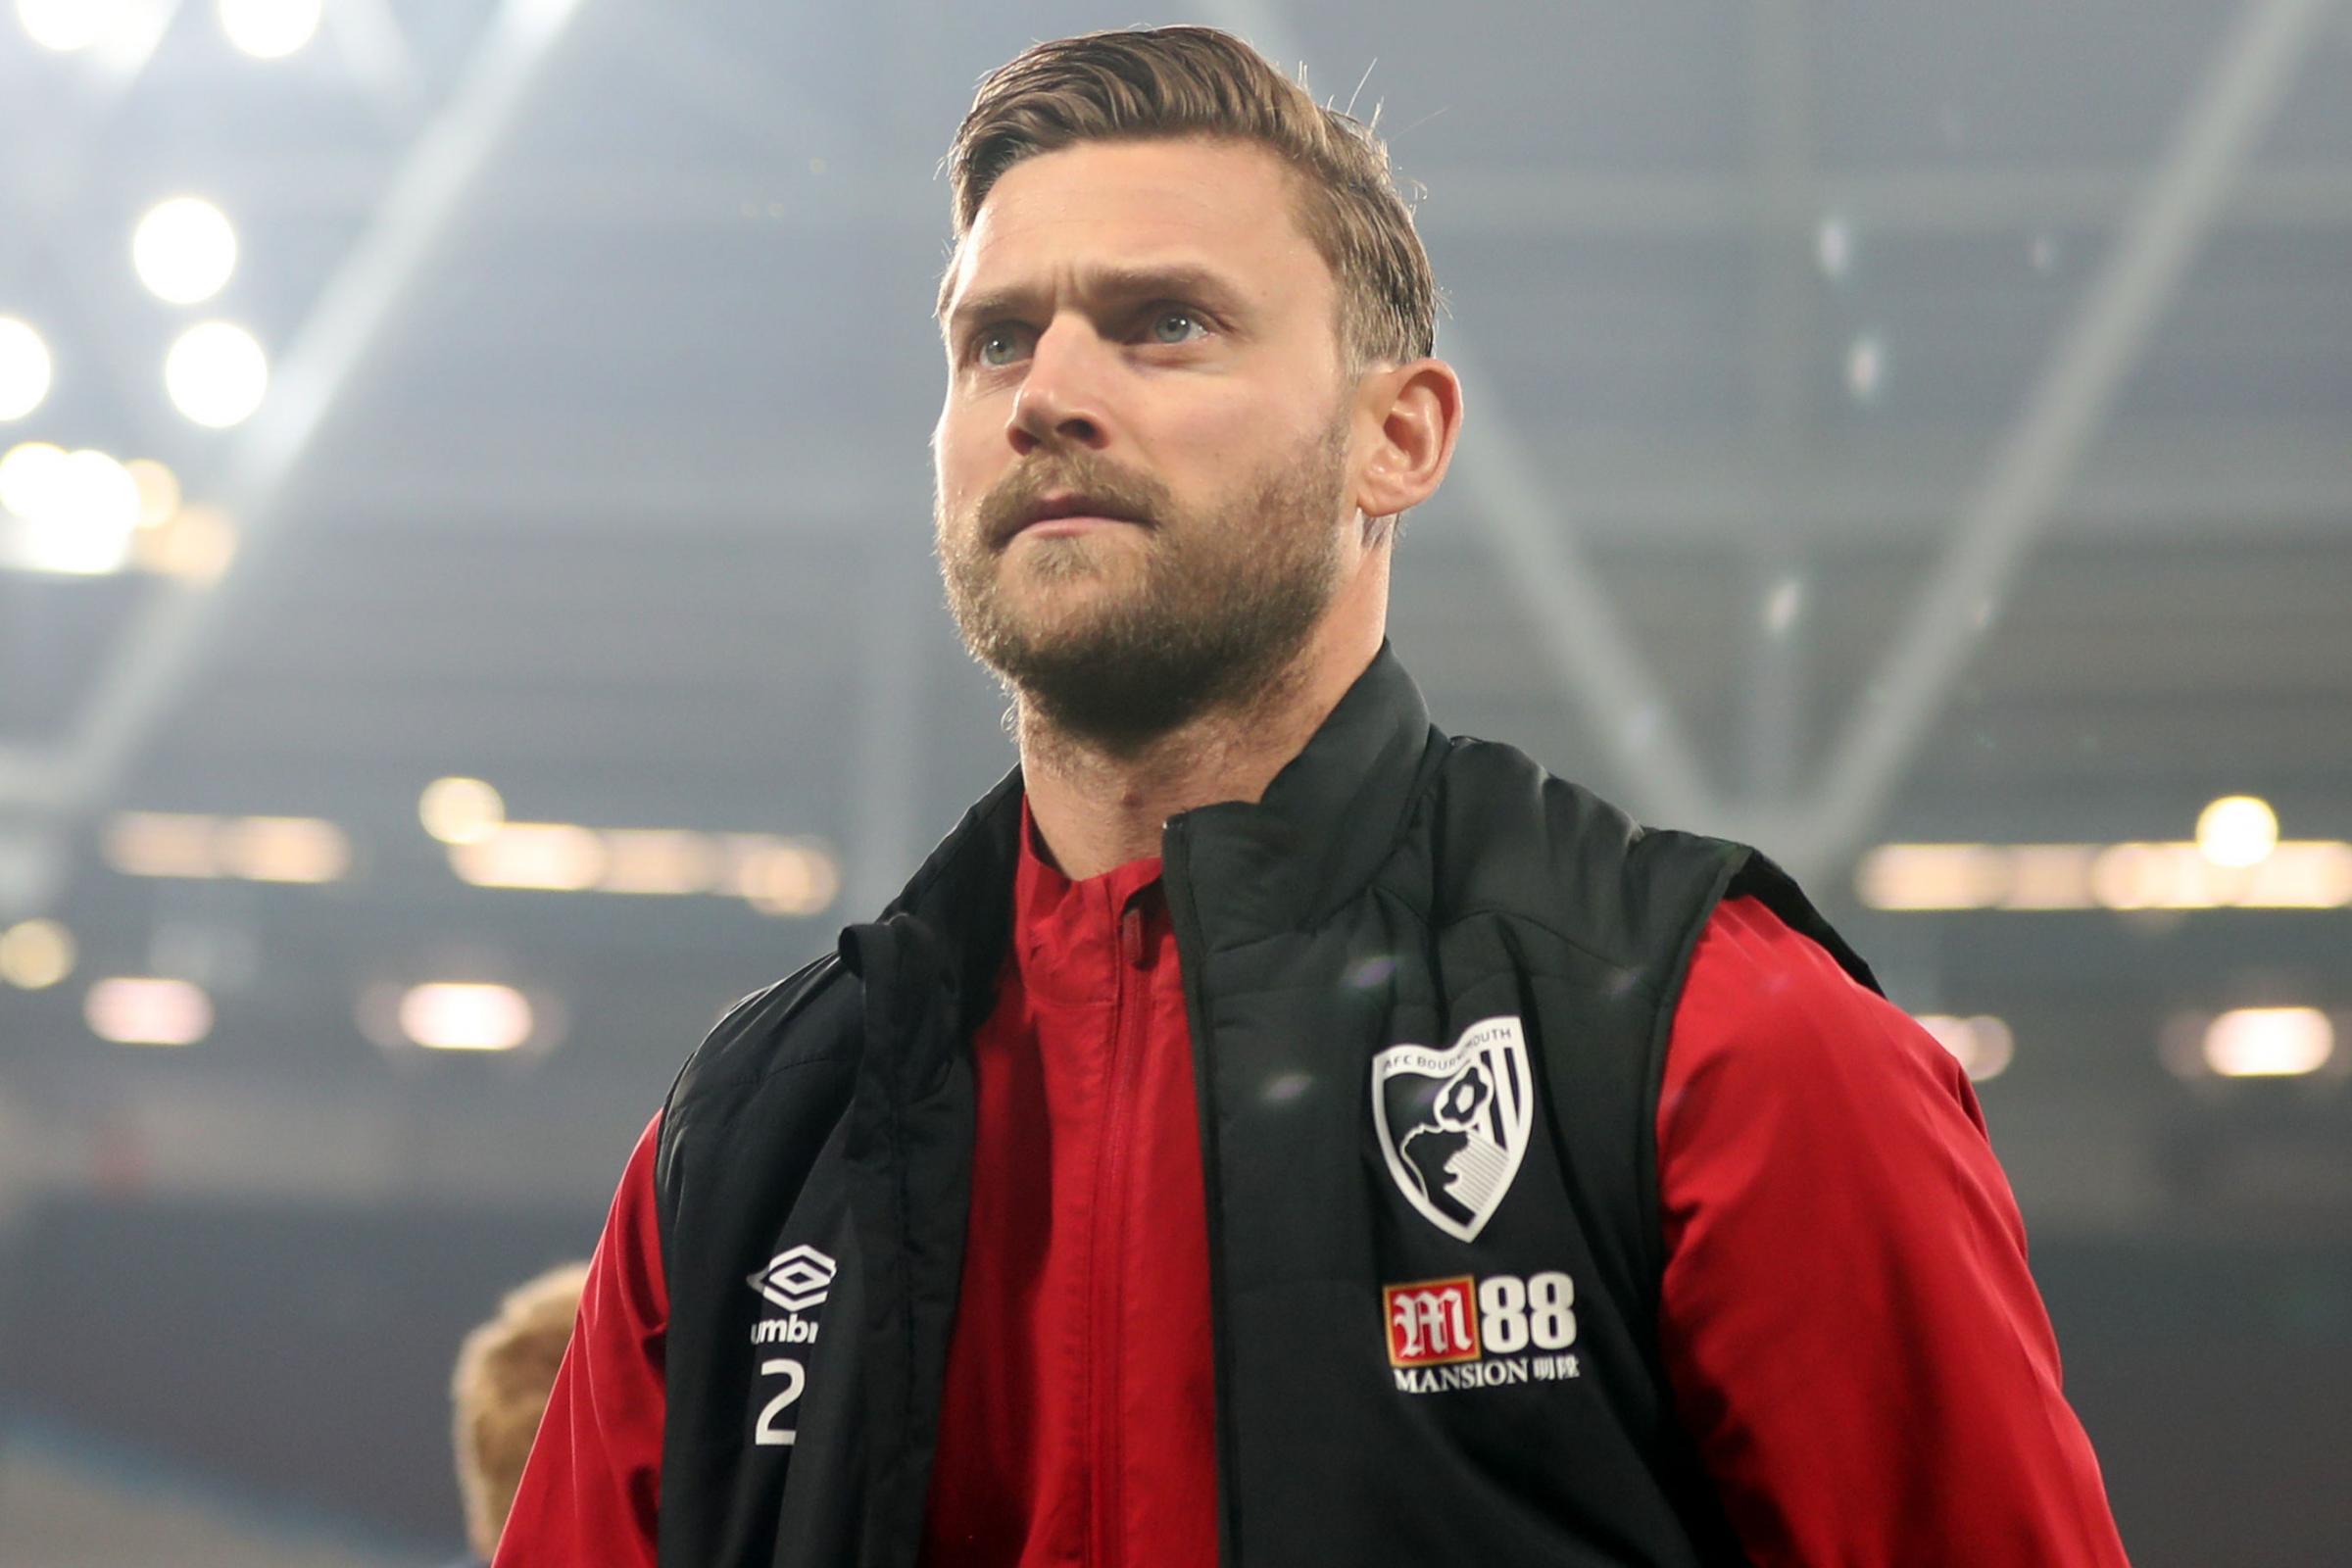 Family focus helps take Simon Francis's mind off Premier League intensity